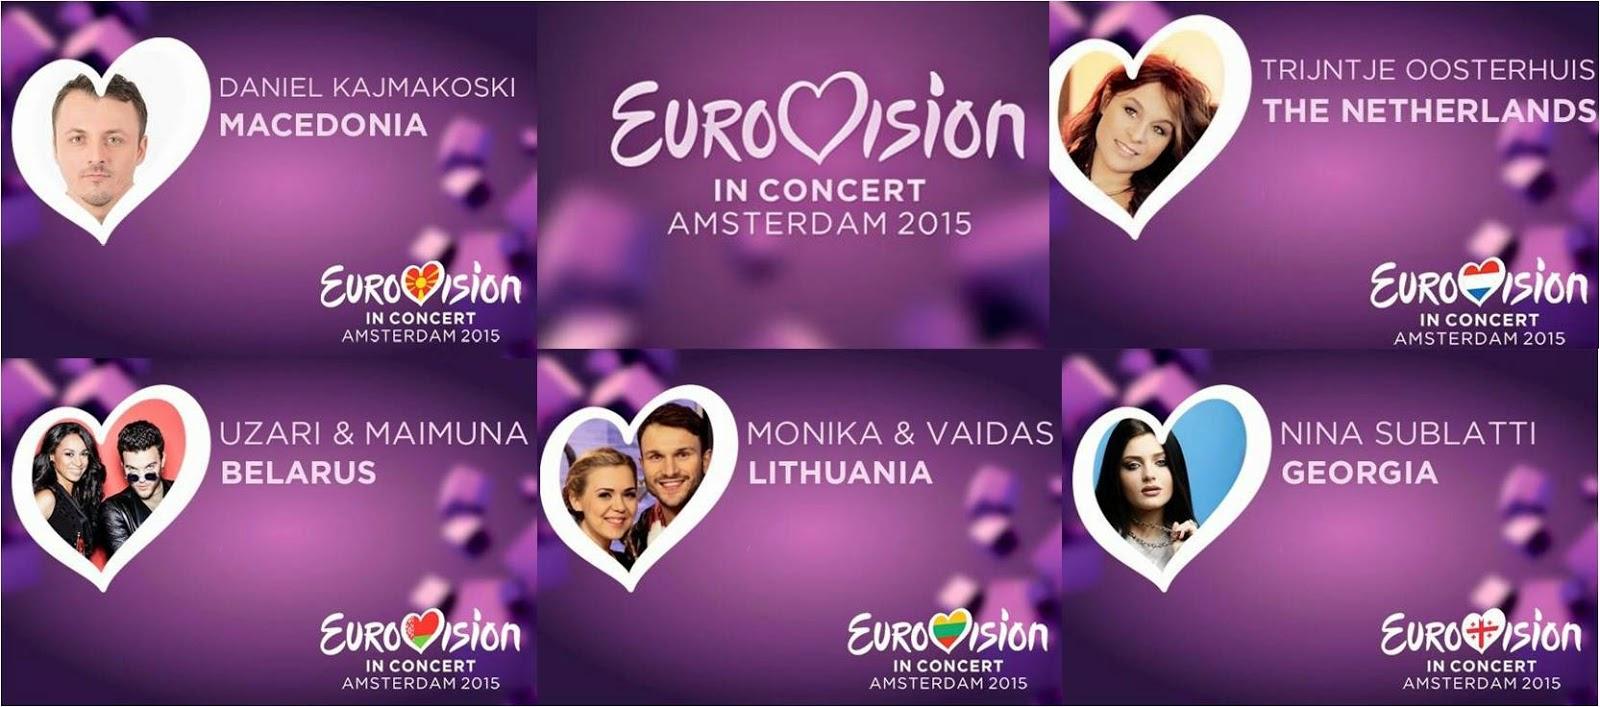 Eurovision in Concert 2015: Performances of FYROM,Netherlands,Belarus, Lithuania,Georgia